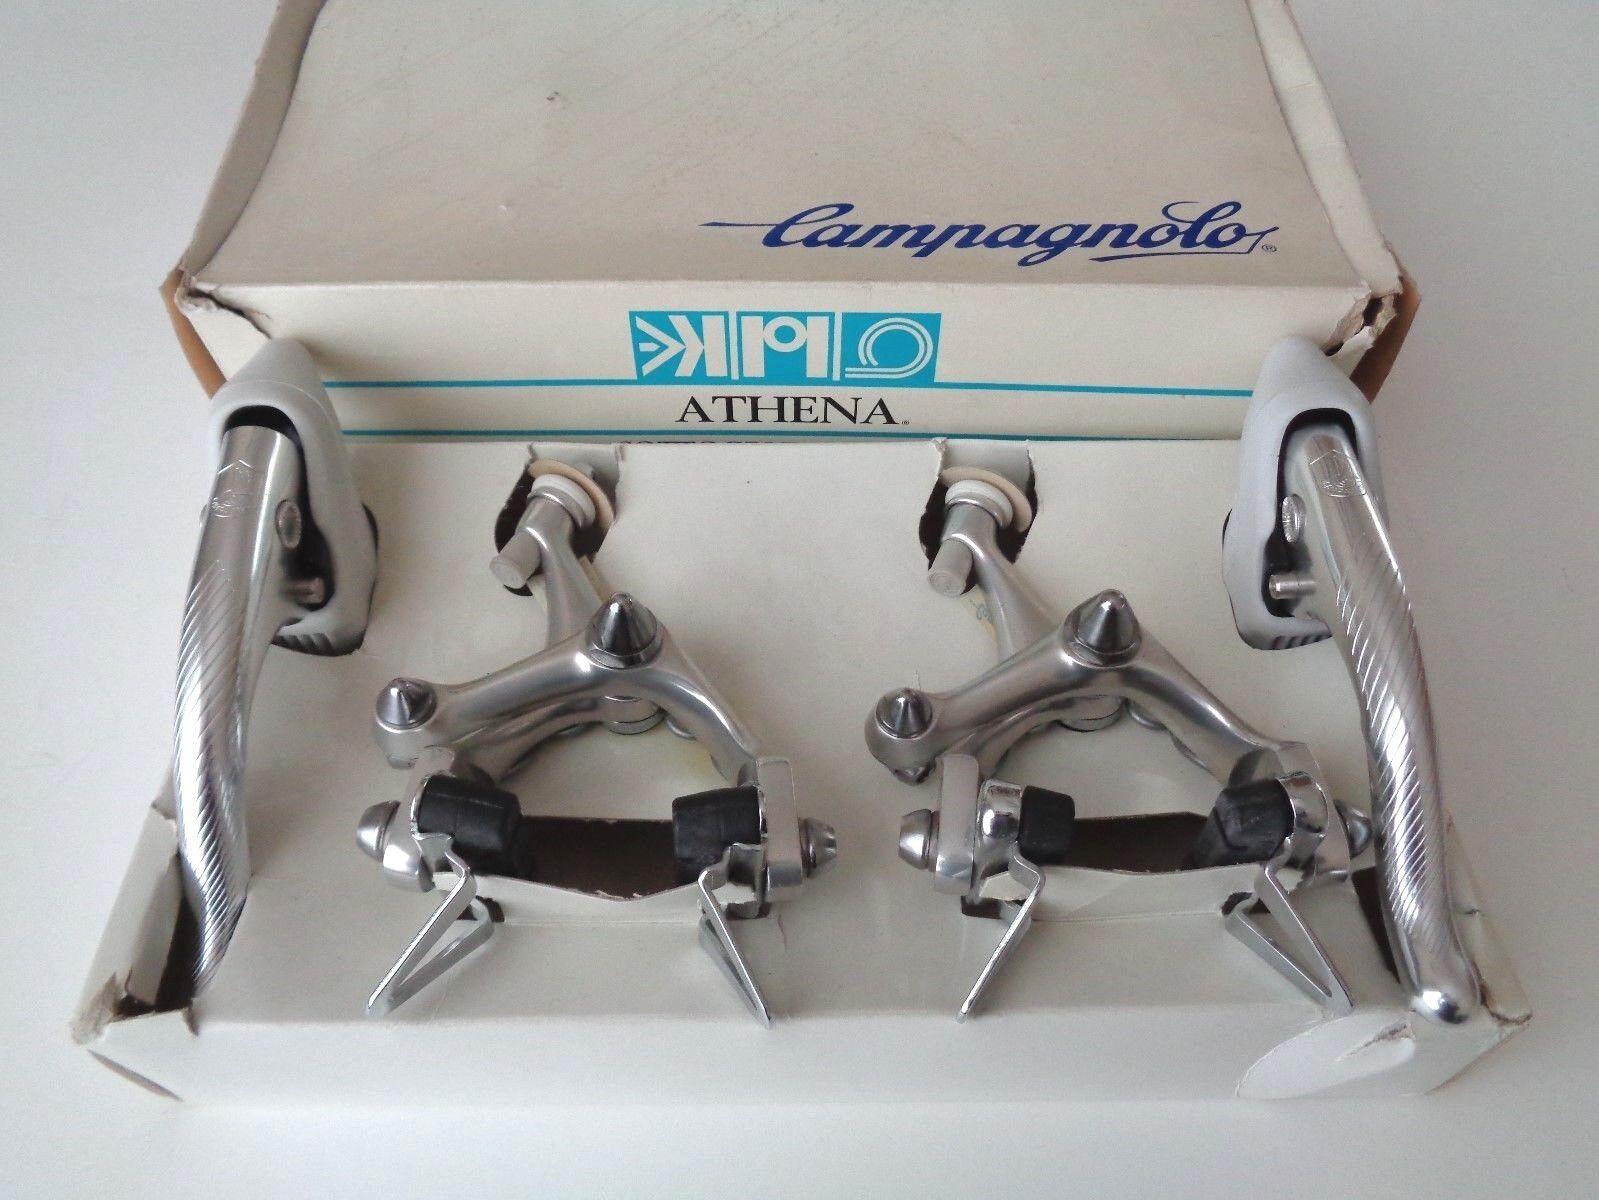 NOS Vintage 1980s Campagnolo Athena (c record era) brake set